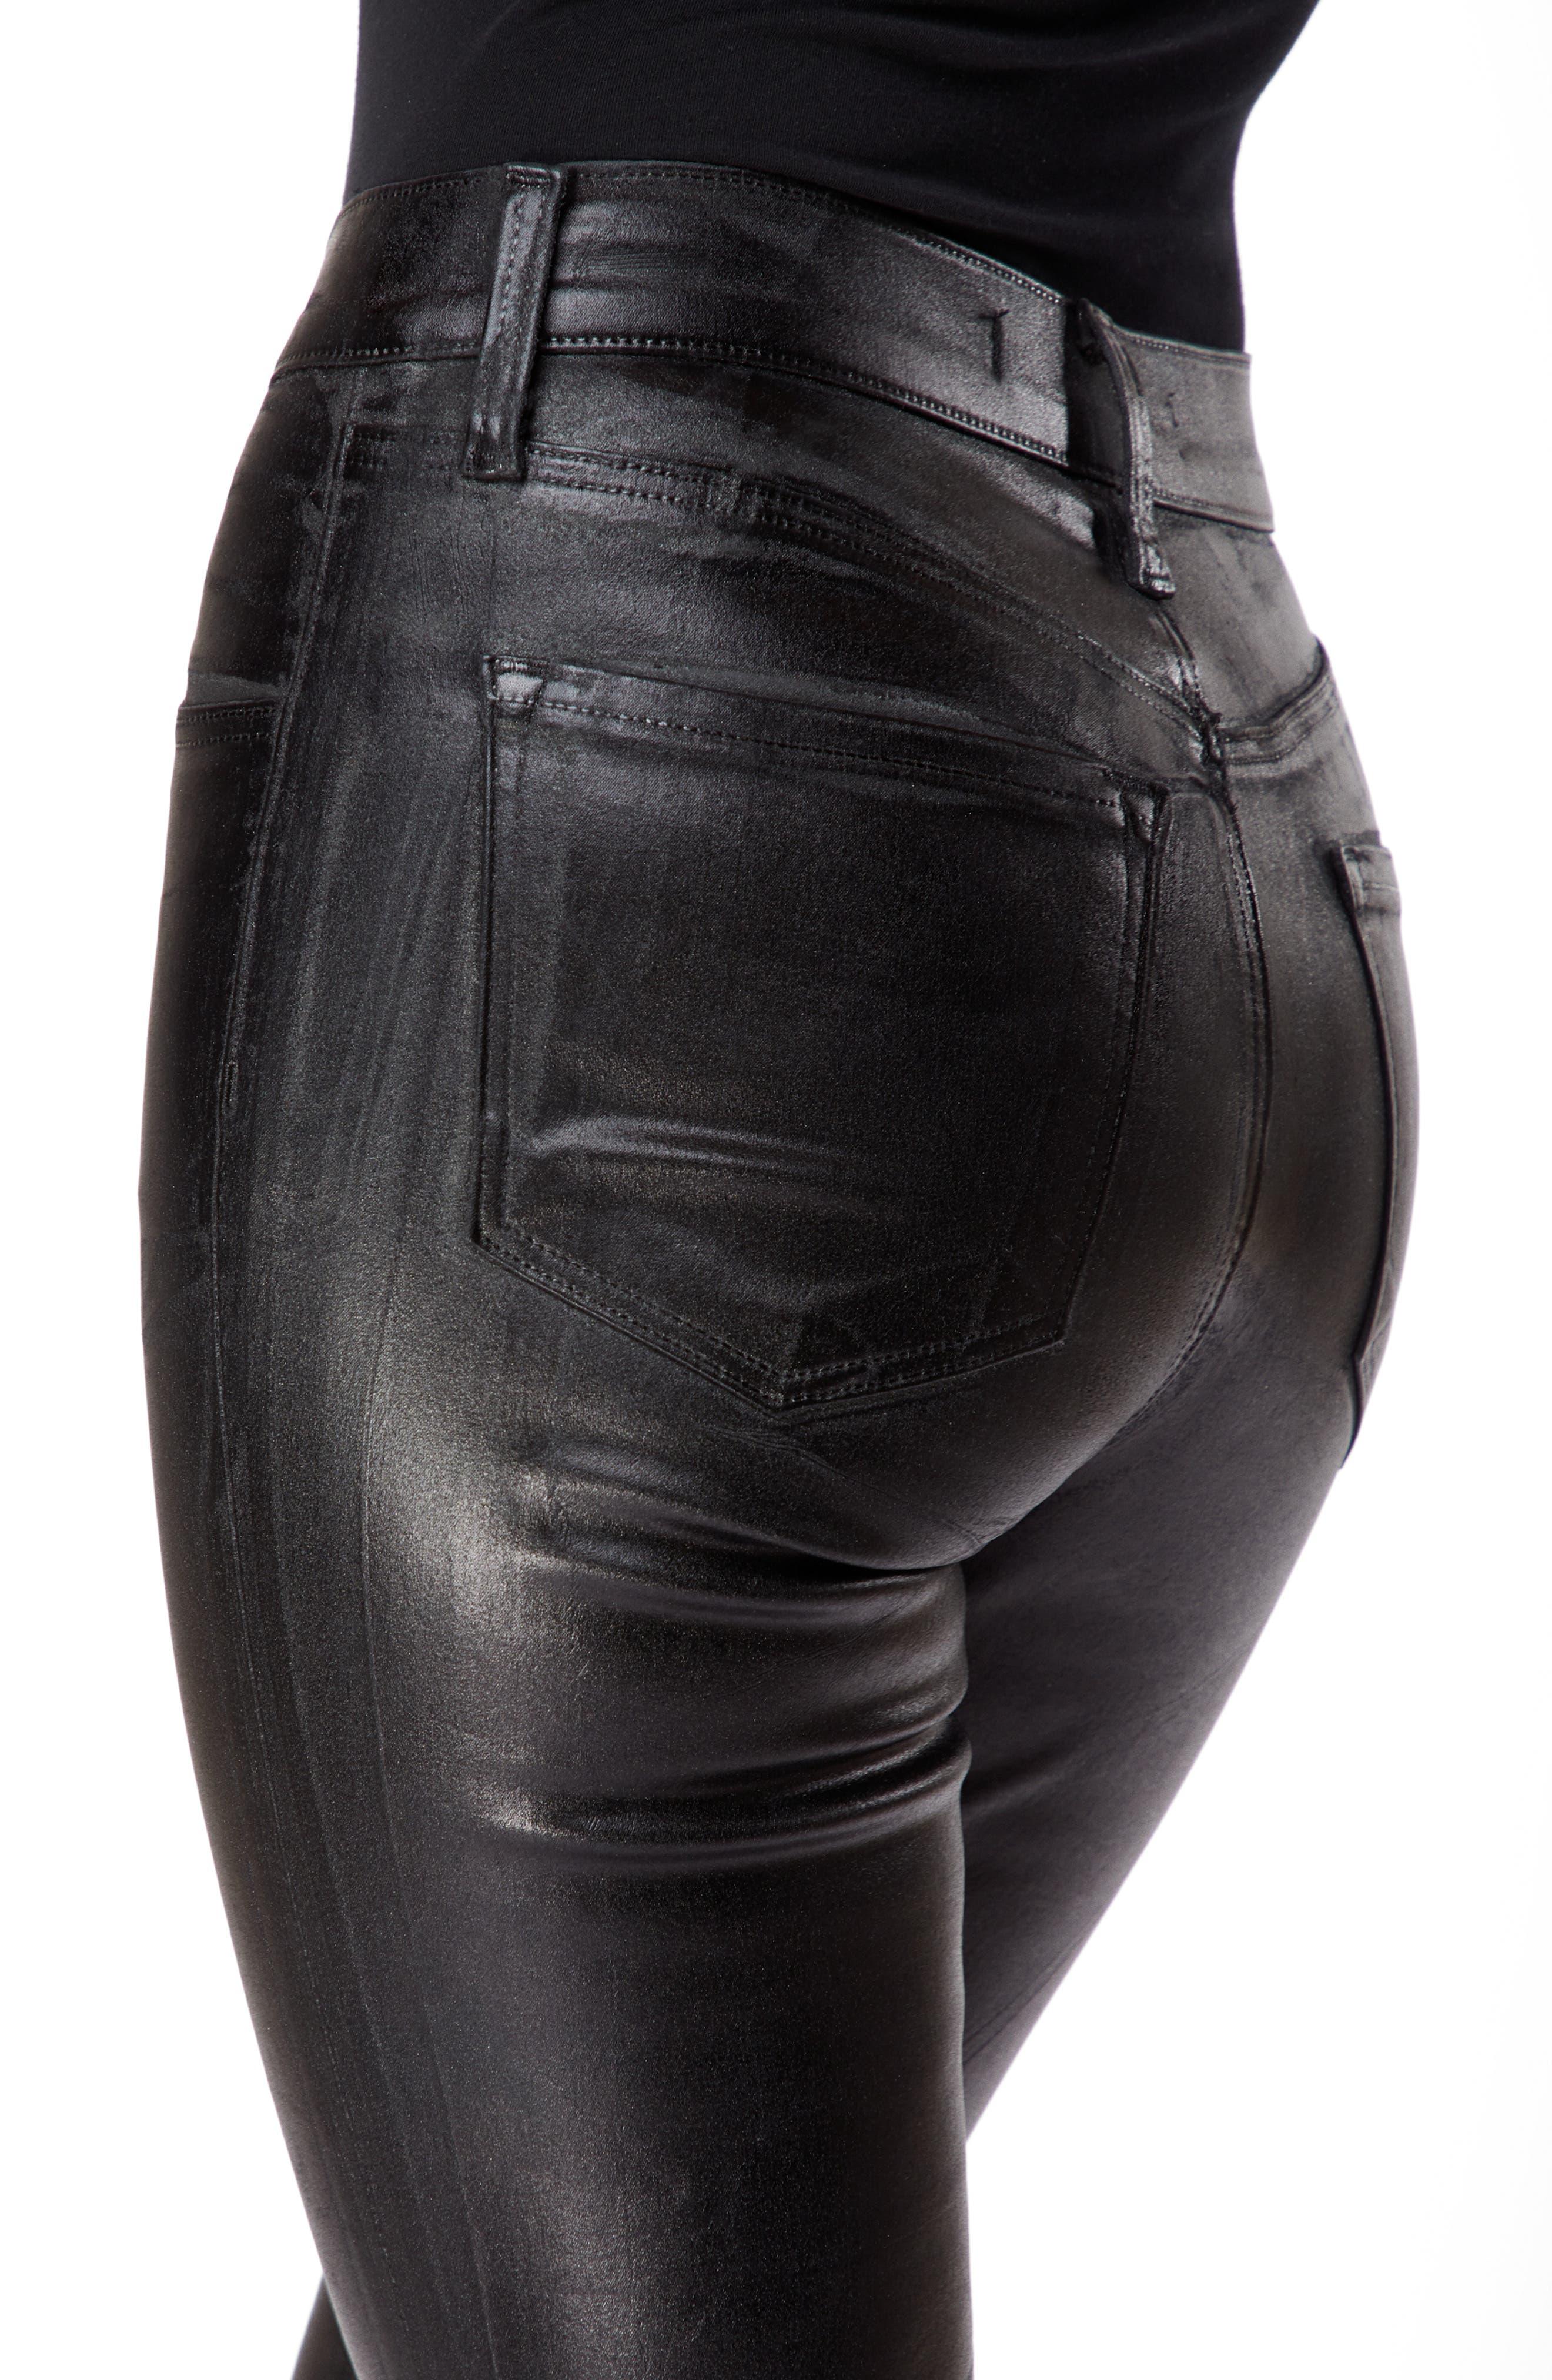 Maria Coated High Waist Skinny Jeans,                             Alternate thumbnail 4, color,                             009